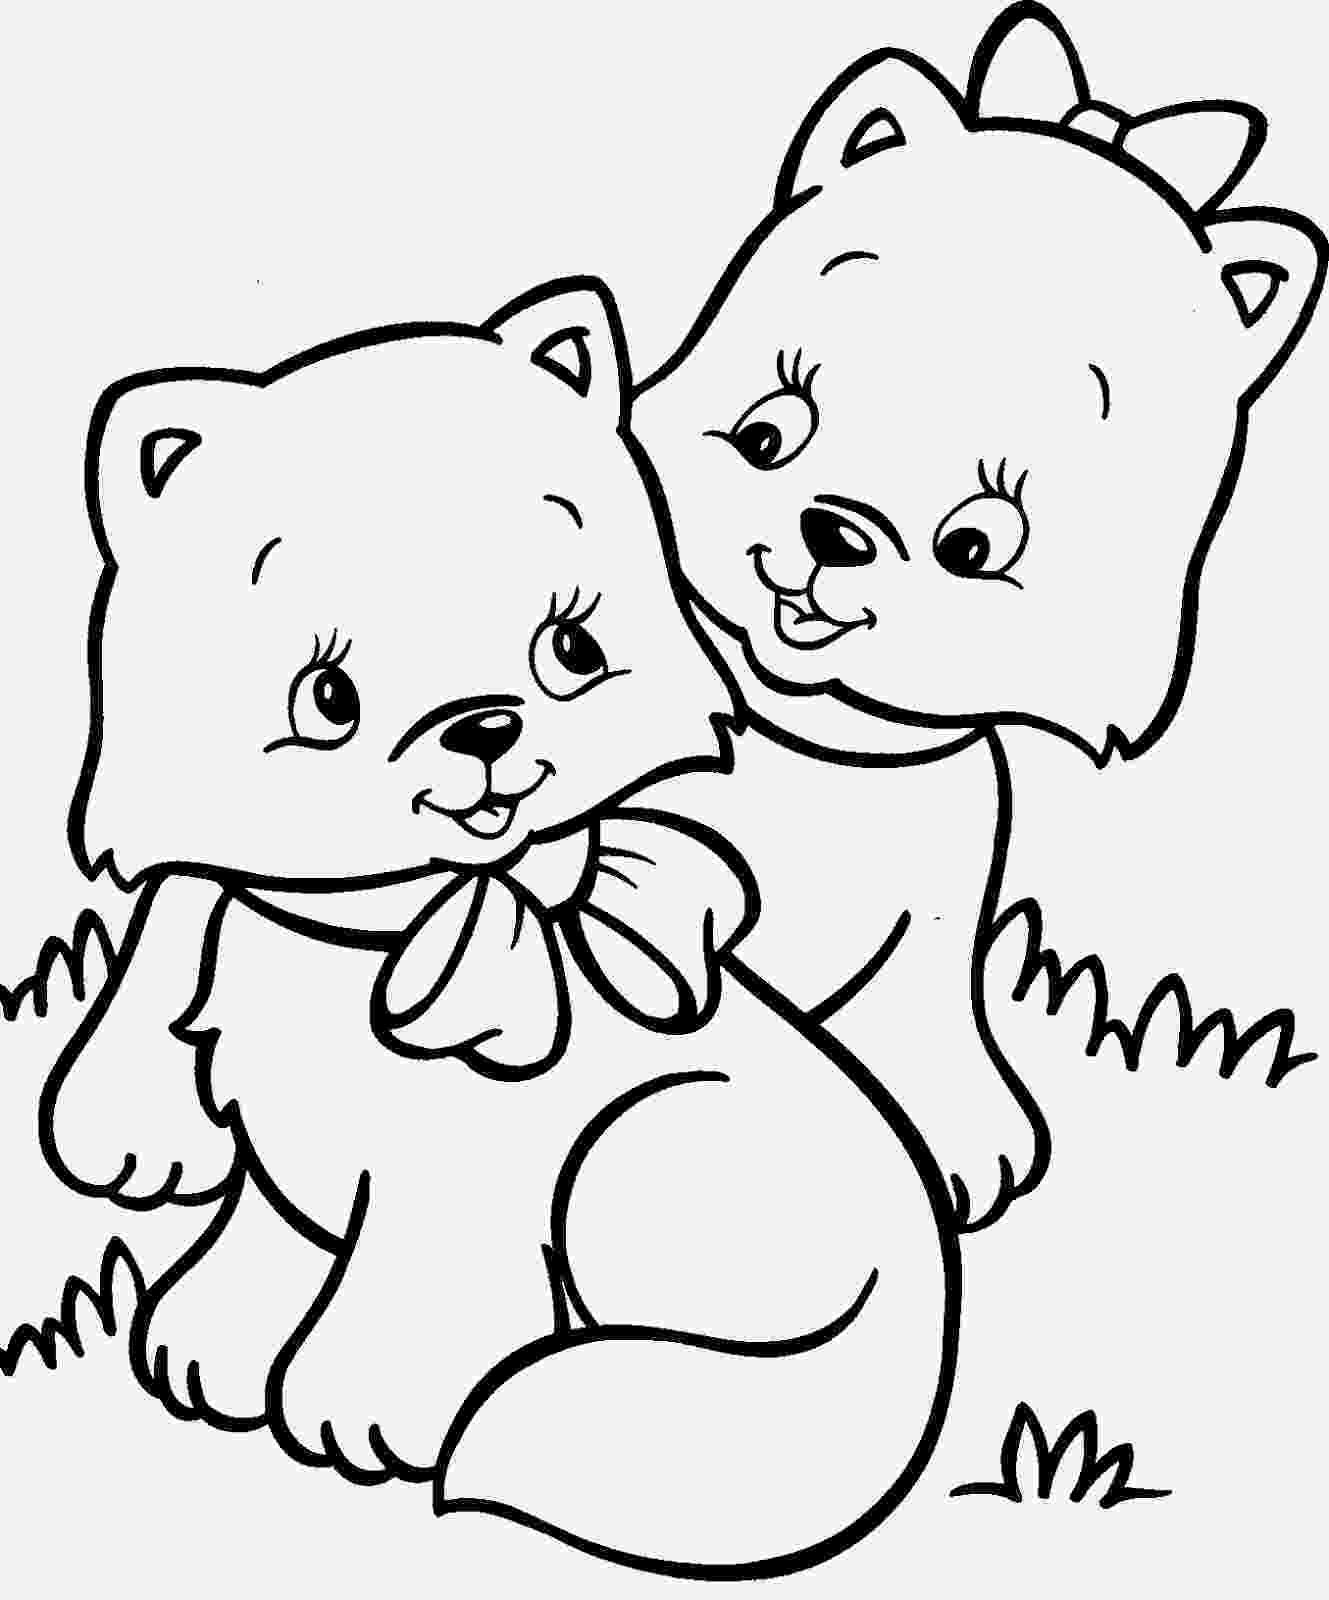 coloring pages cute cats navishta sketch sweet cute angle cats pages coloring cute cats